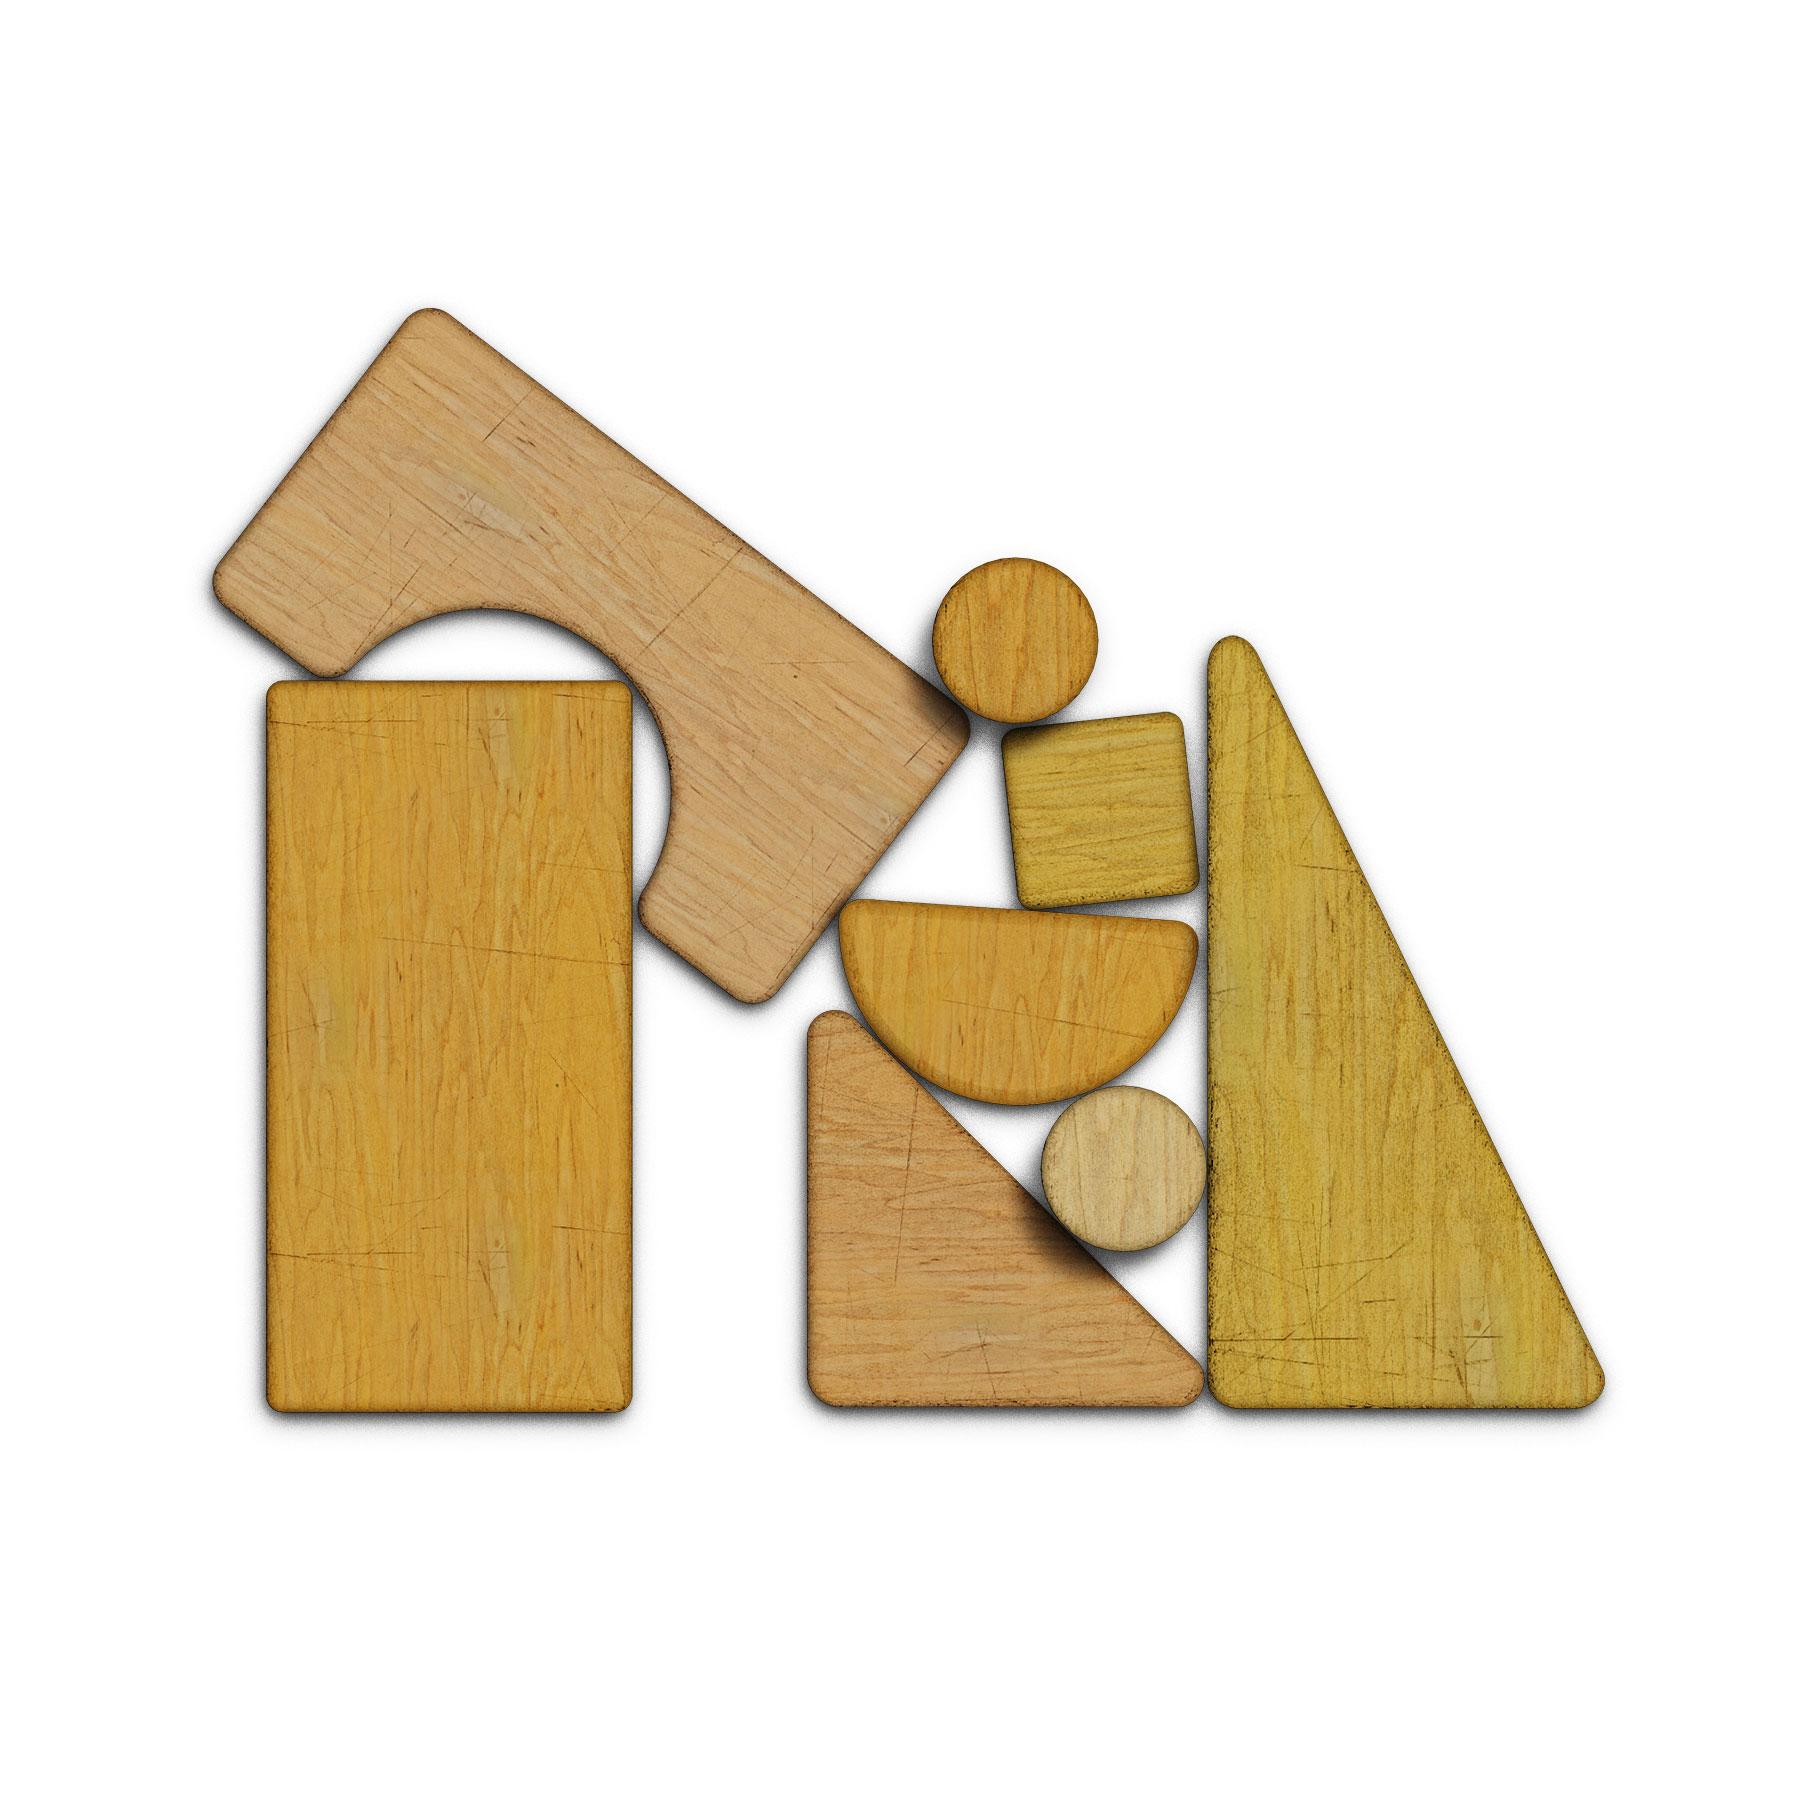 180920_Westland_Wooden_Blocks_Equity.jpg